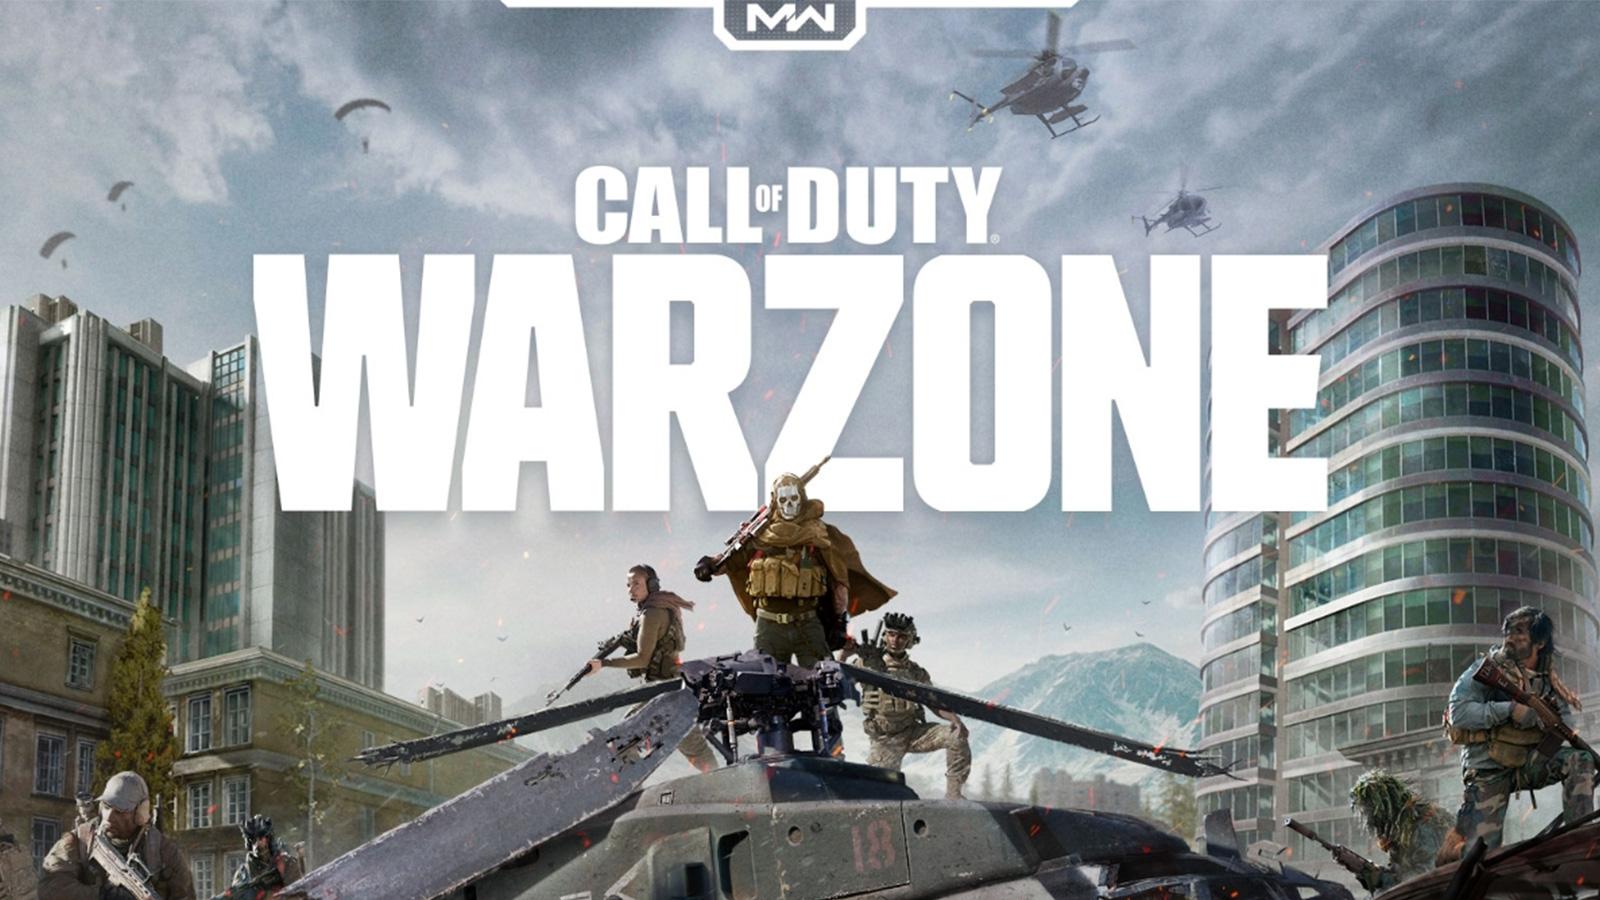 Call of Duty Warzone jeu